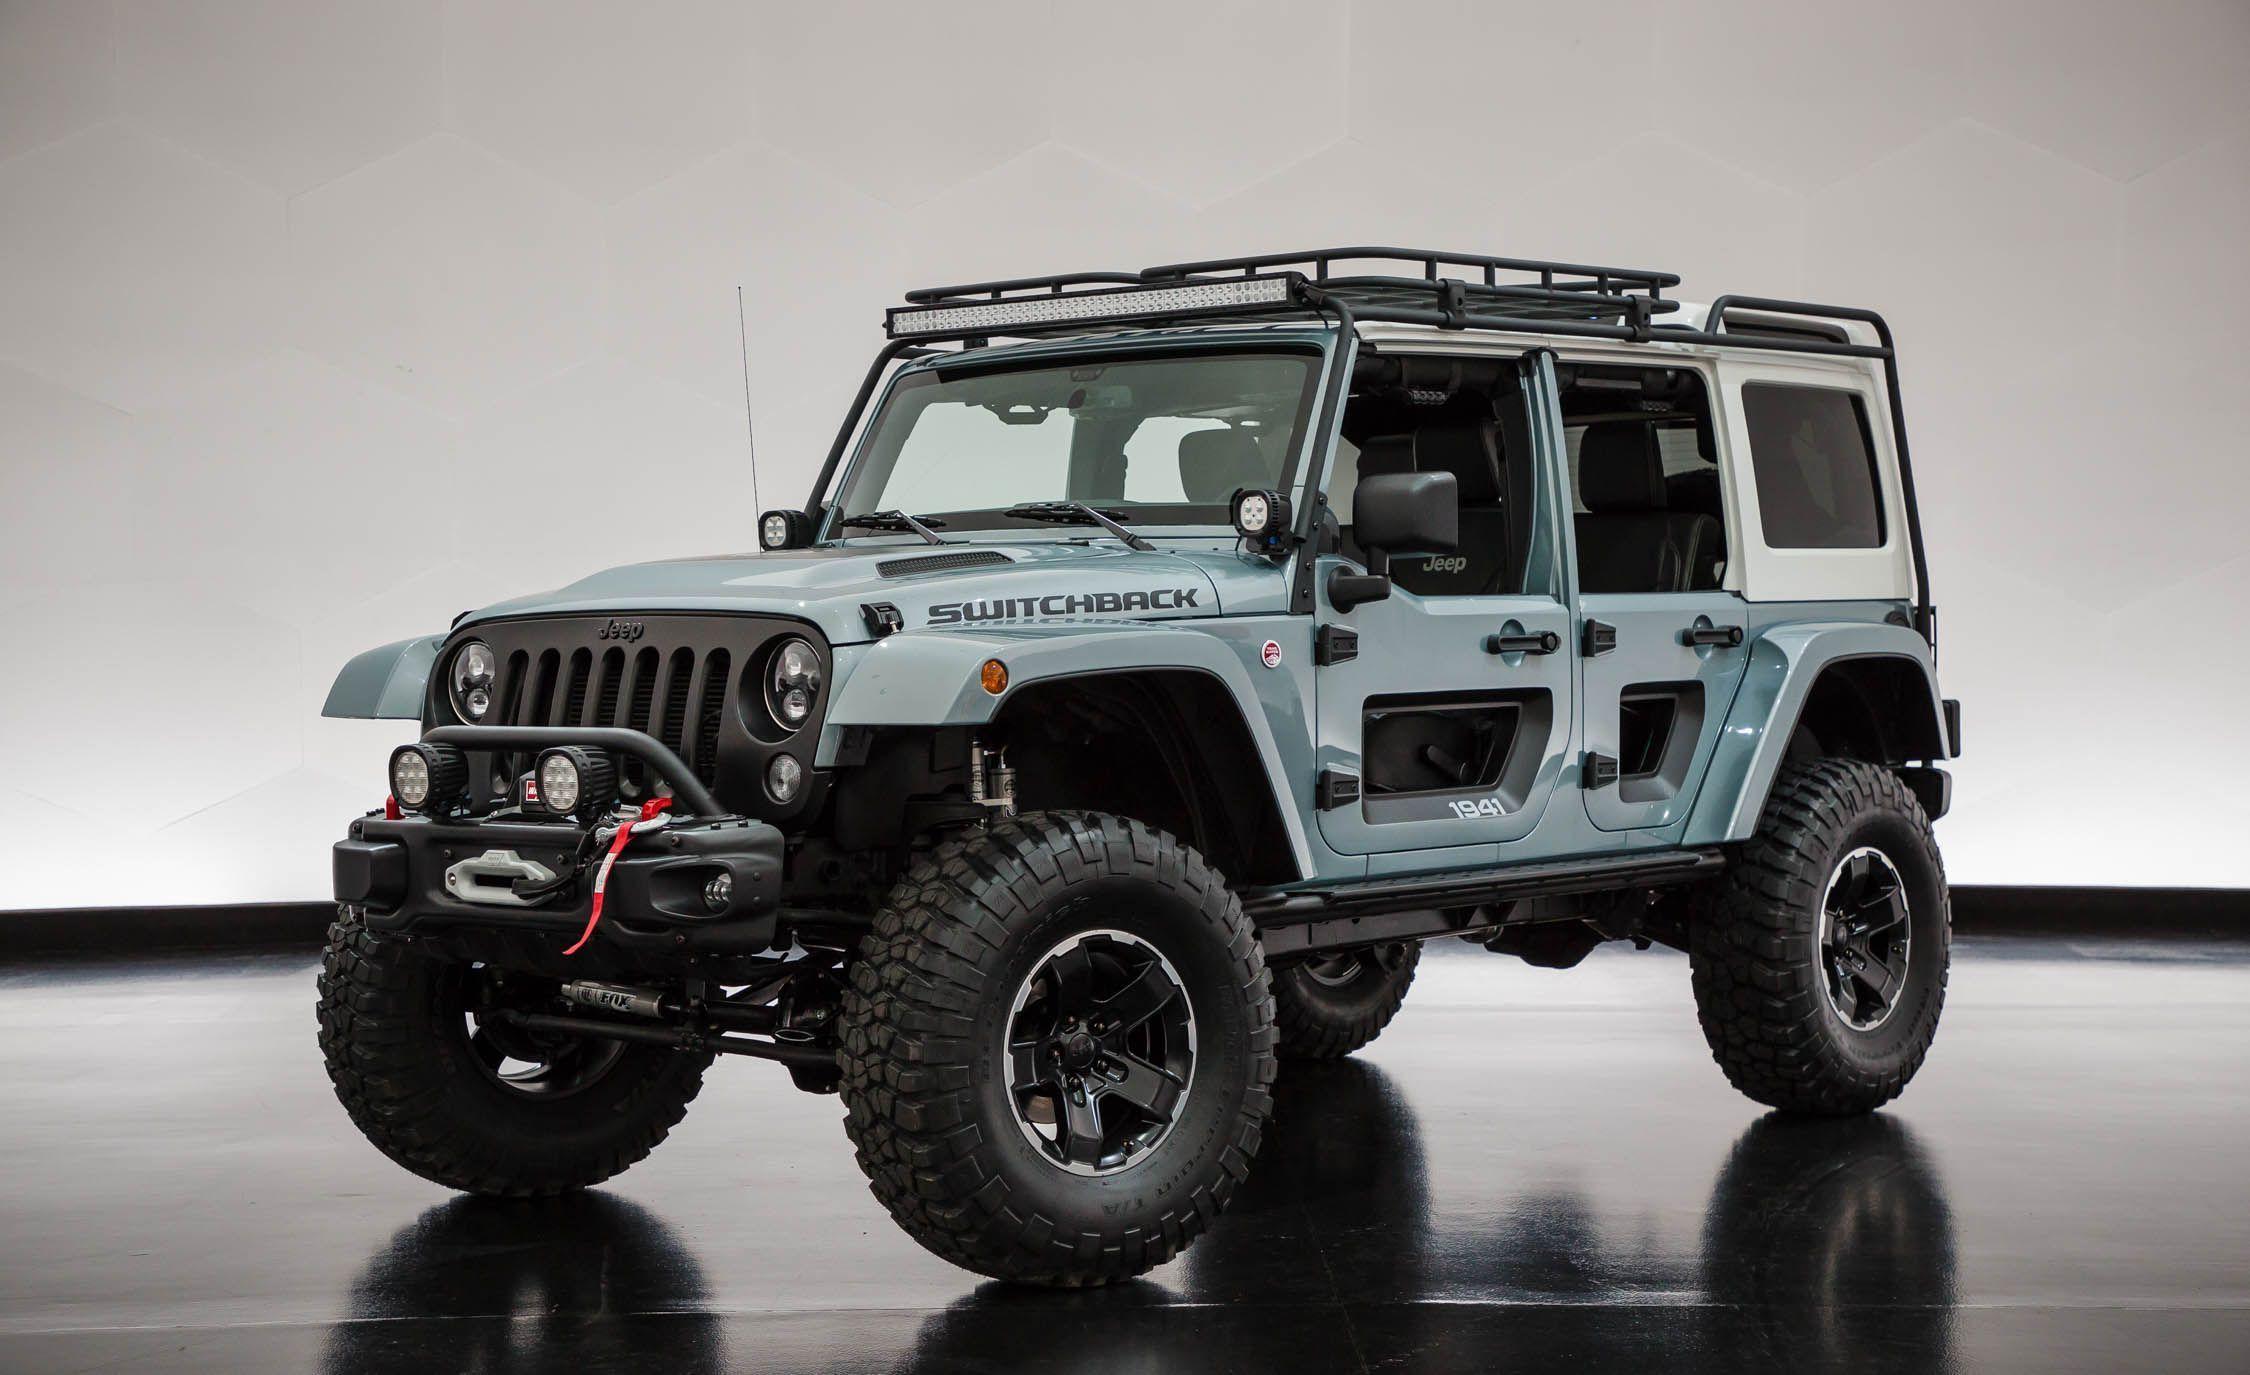 Best Jeep Switchback Easter Jeep Safari Cool Jeeps Jeep Gear